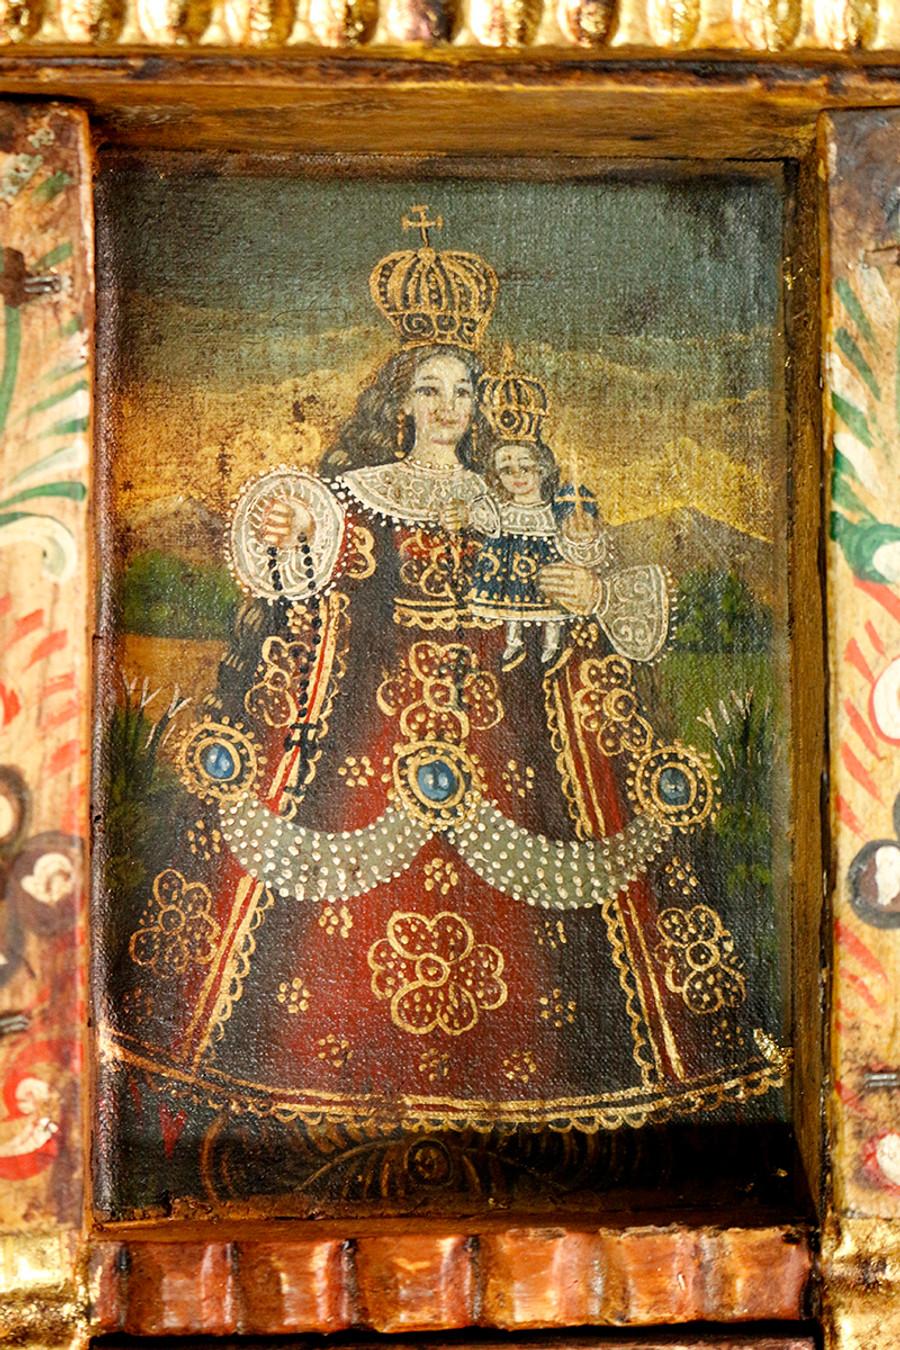 Rosary Lady Virgin Colonial Peru Art Handmade Retablo Handcarved Altarpiece